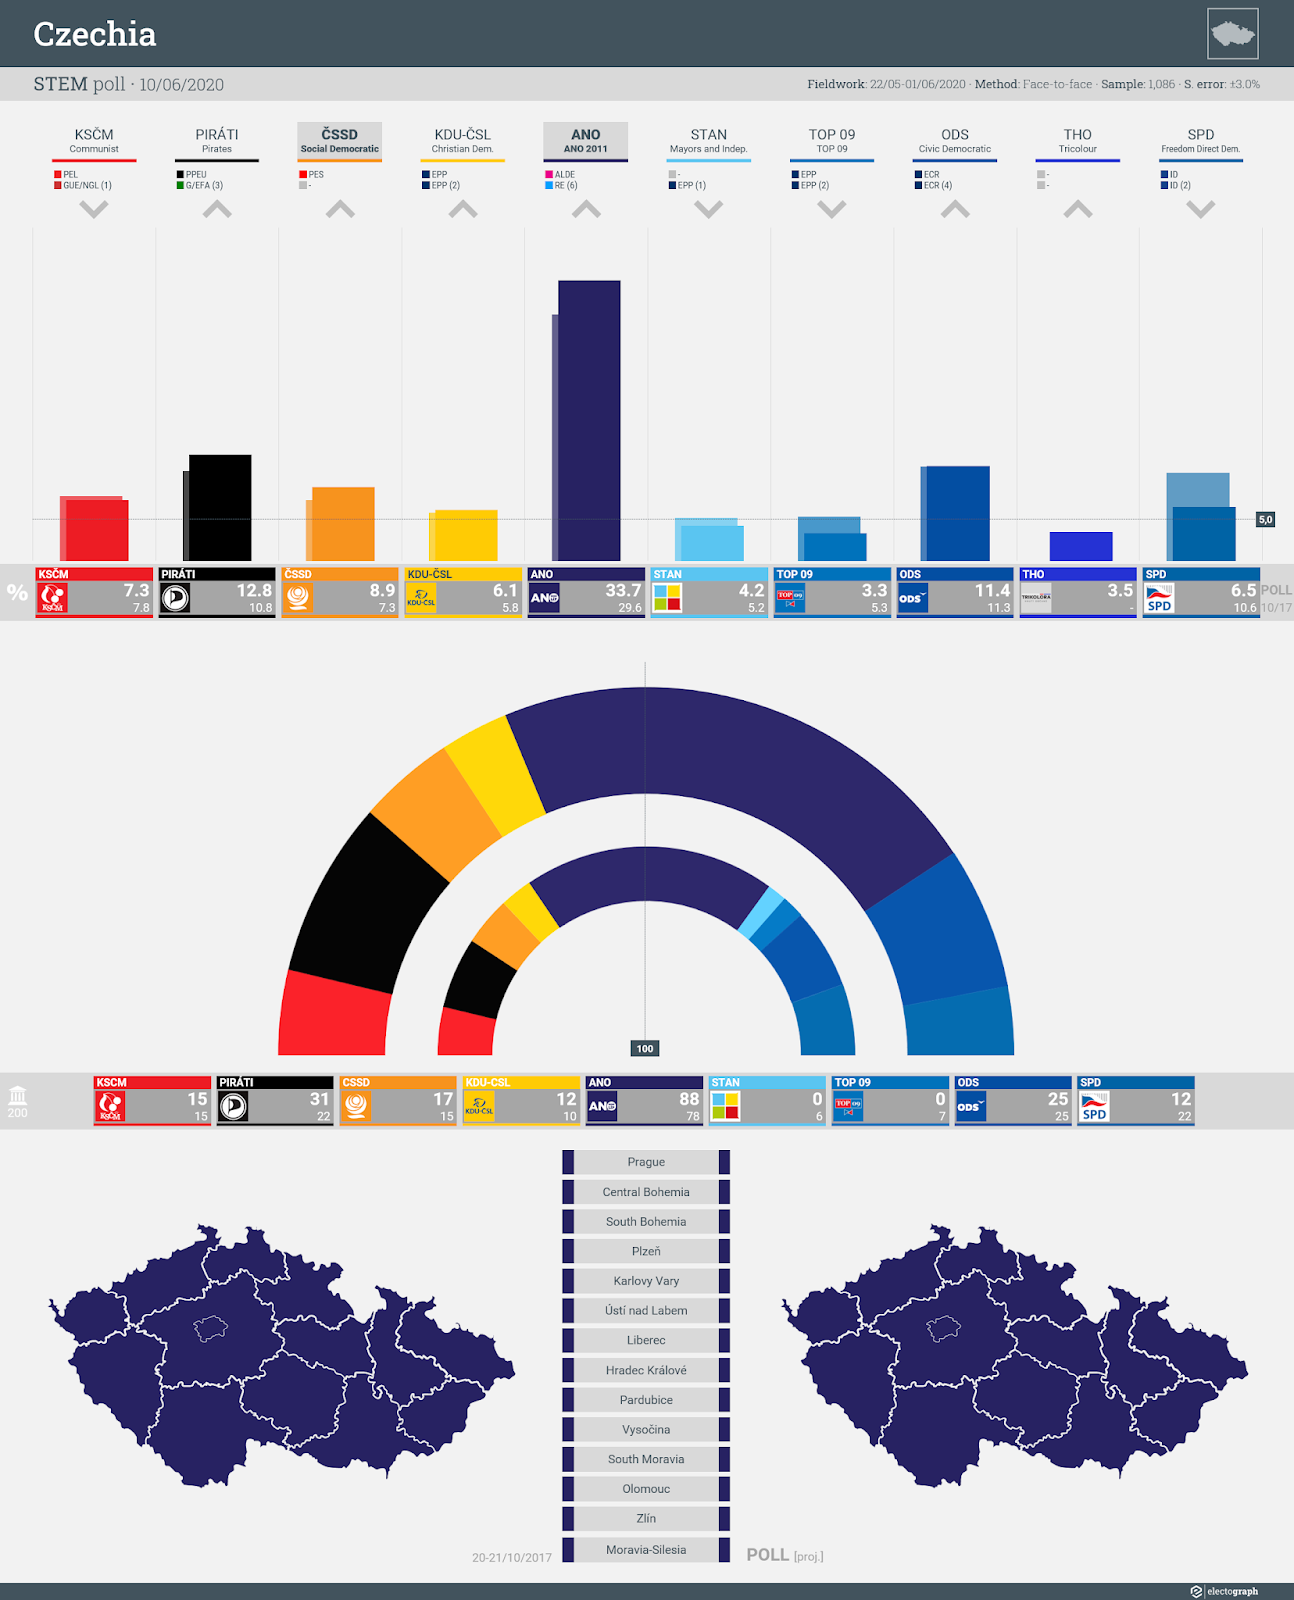 CZECHIA: STEM poll chart, 10 June 2019